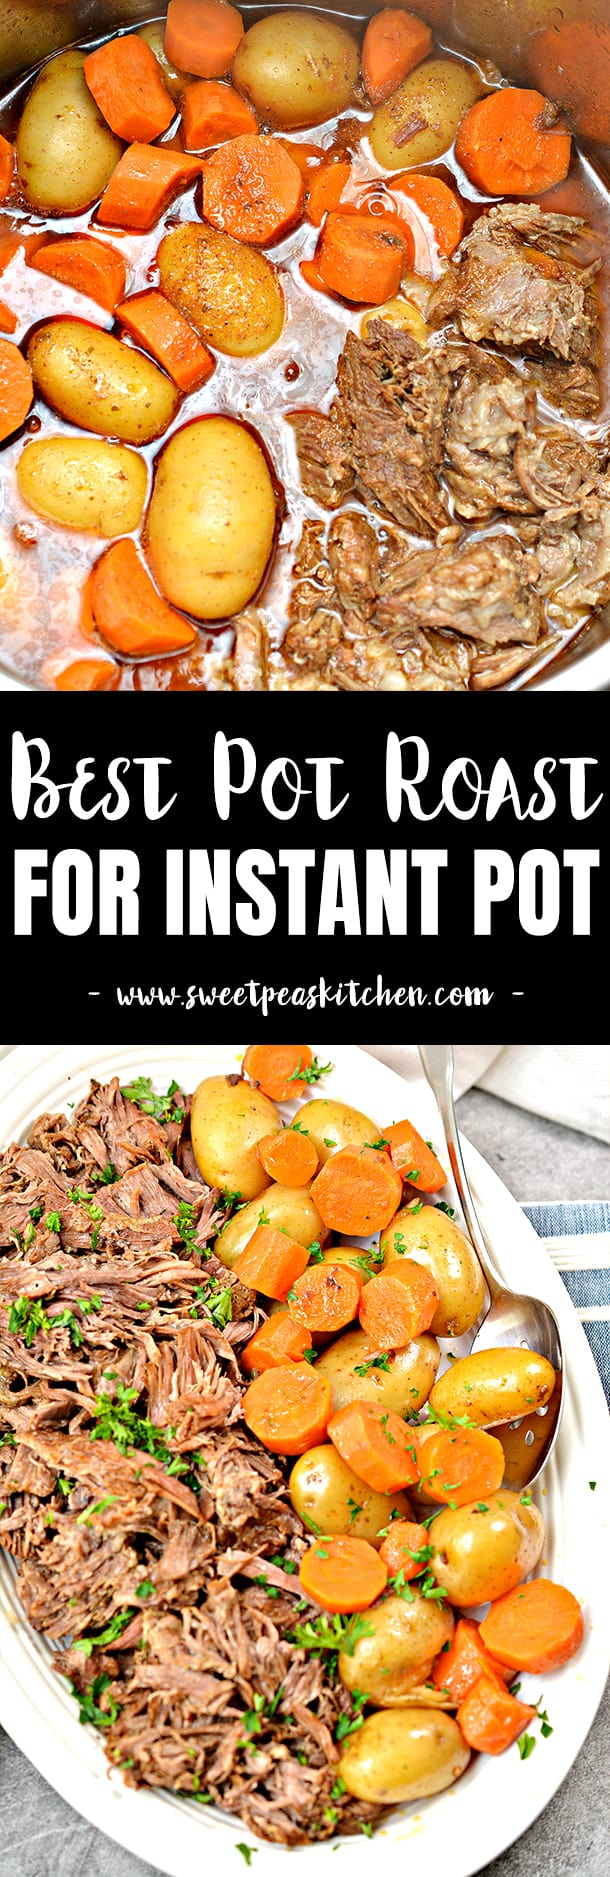 Best Pot Roast Recipe for Instant Pot